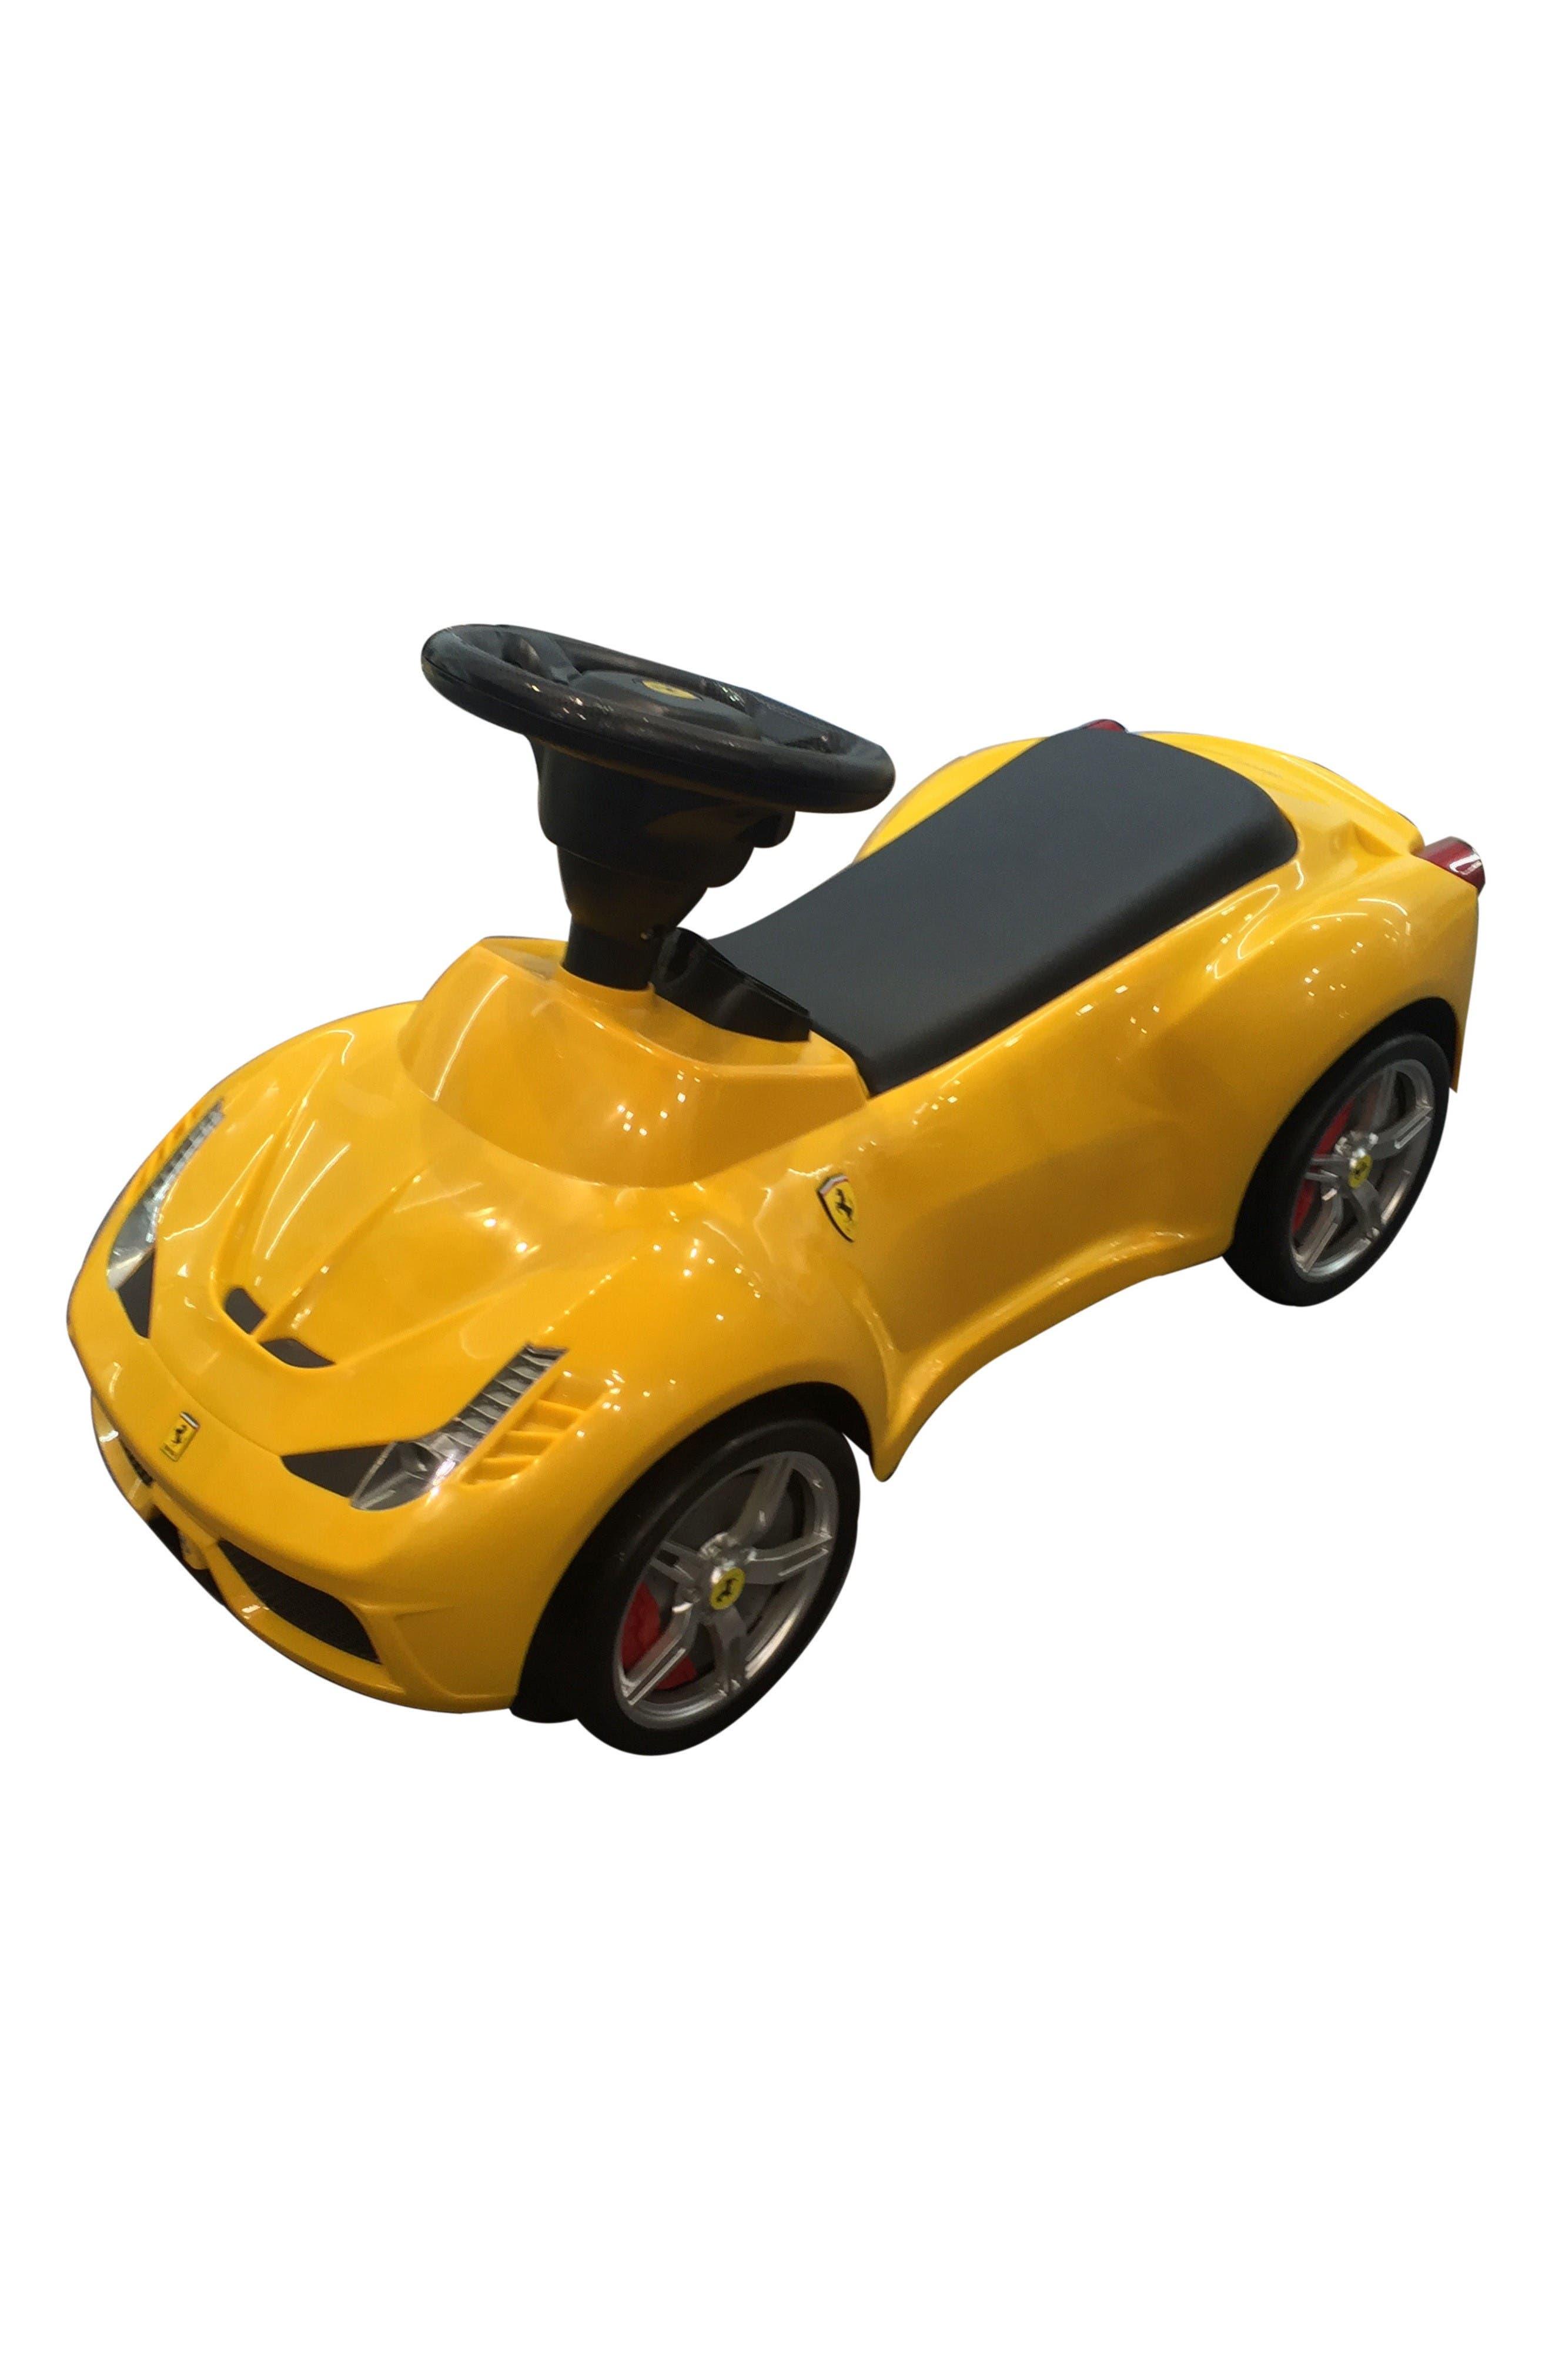 Best Ride on Cars Ferrari Ride-On Push Car